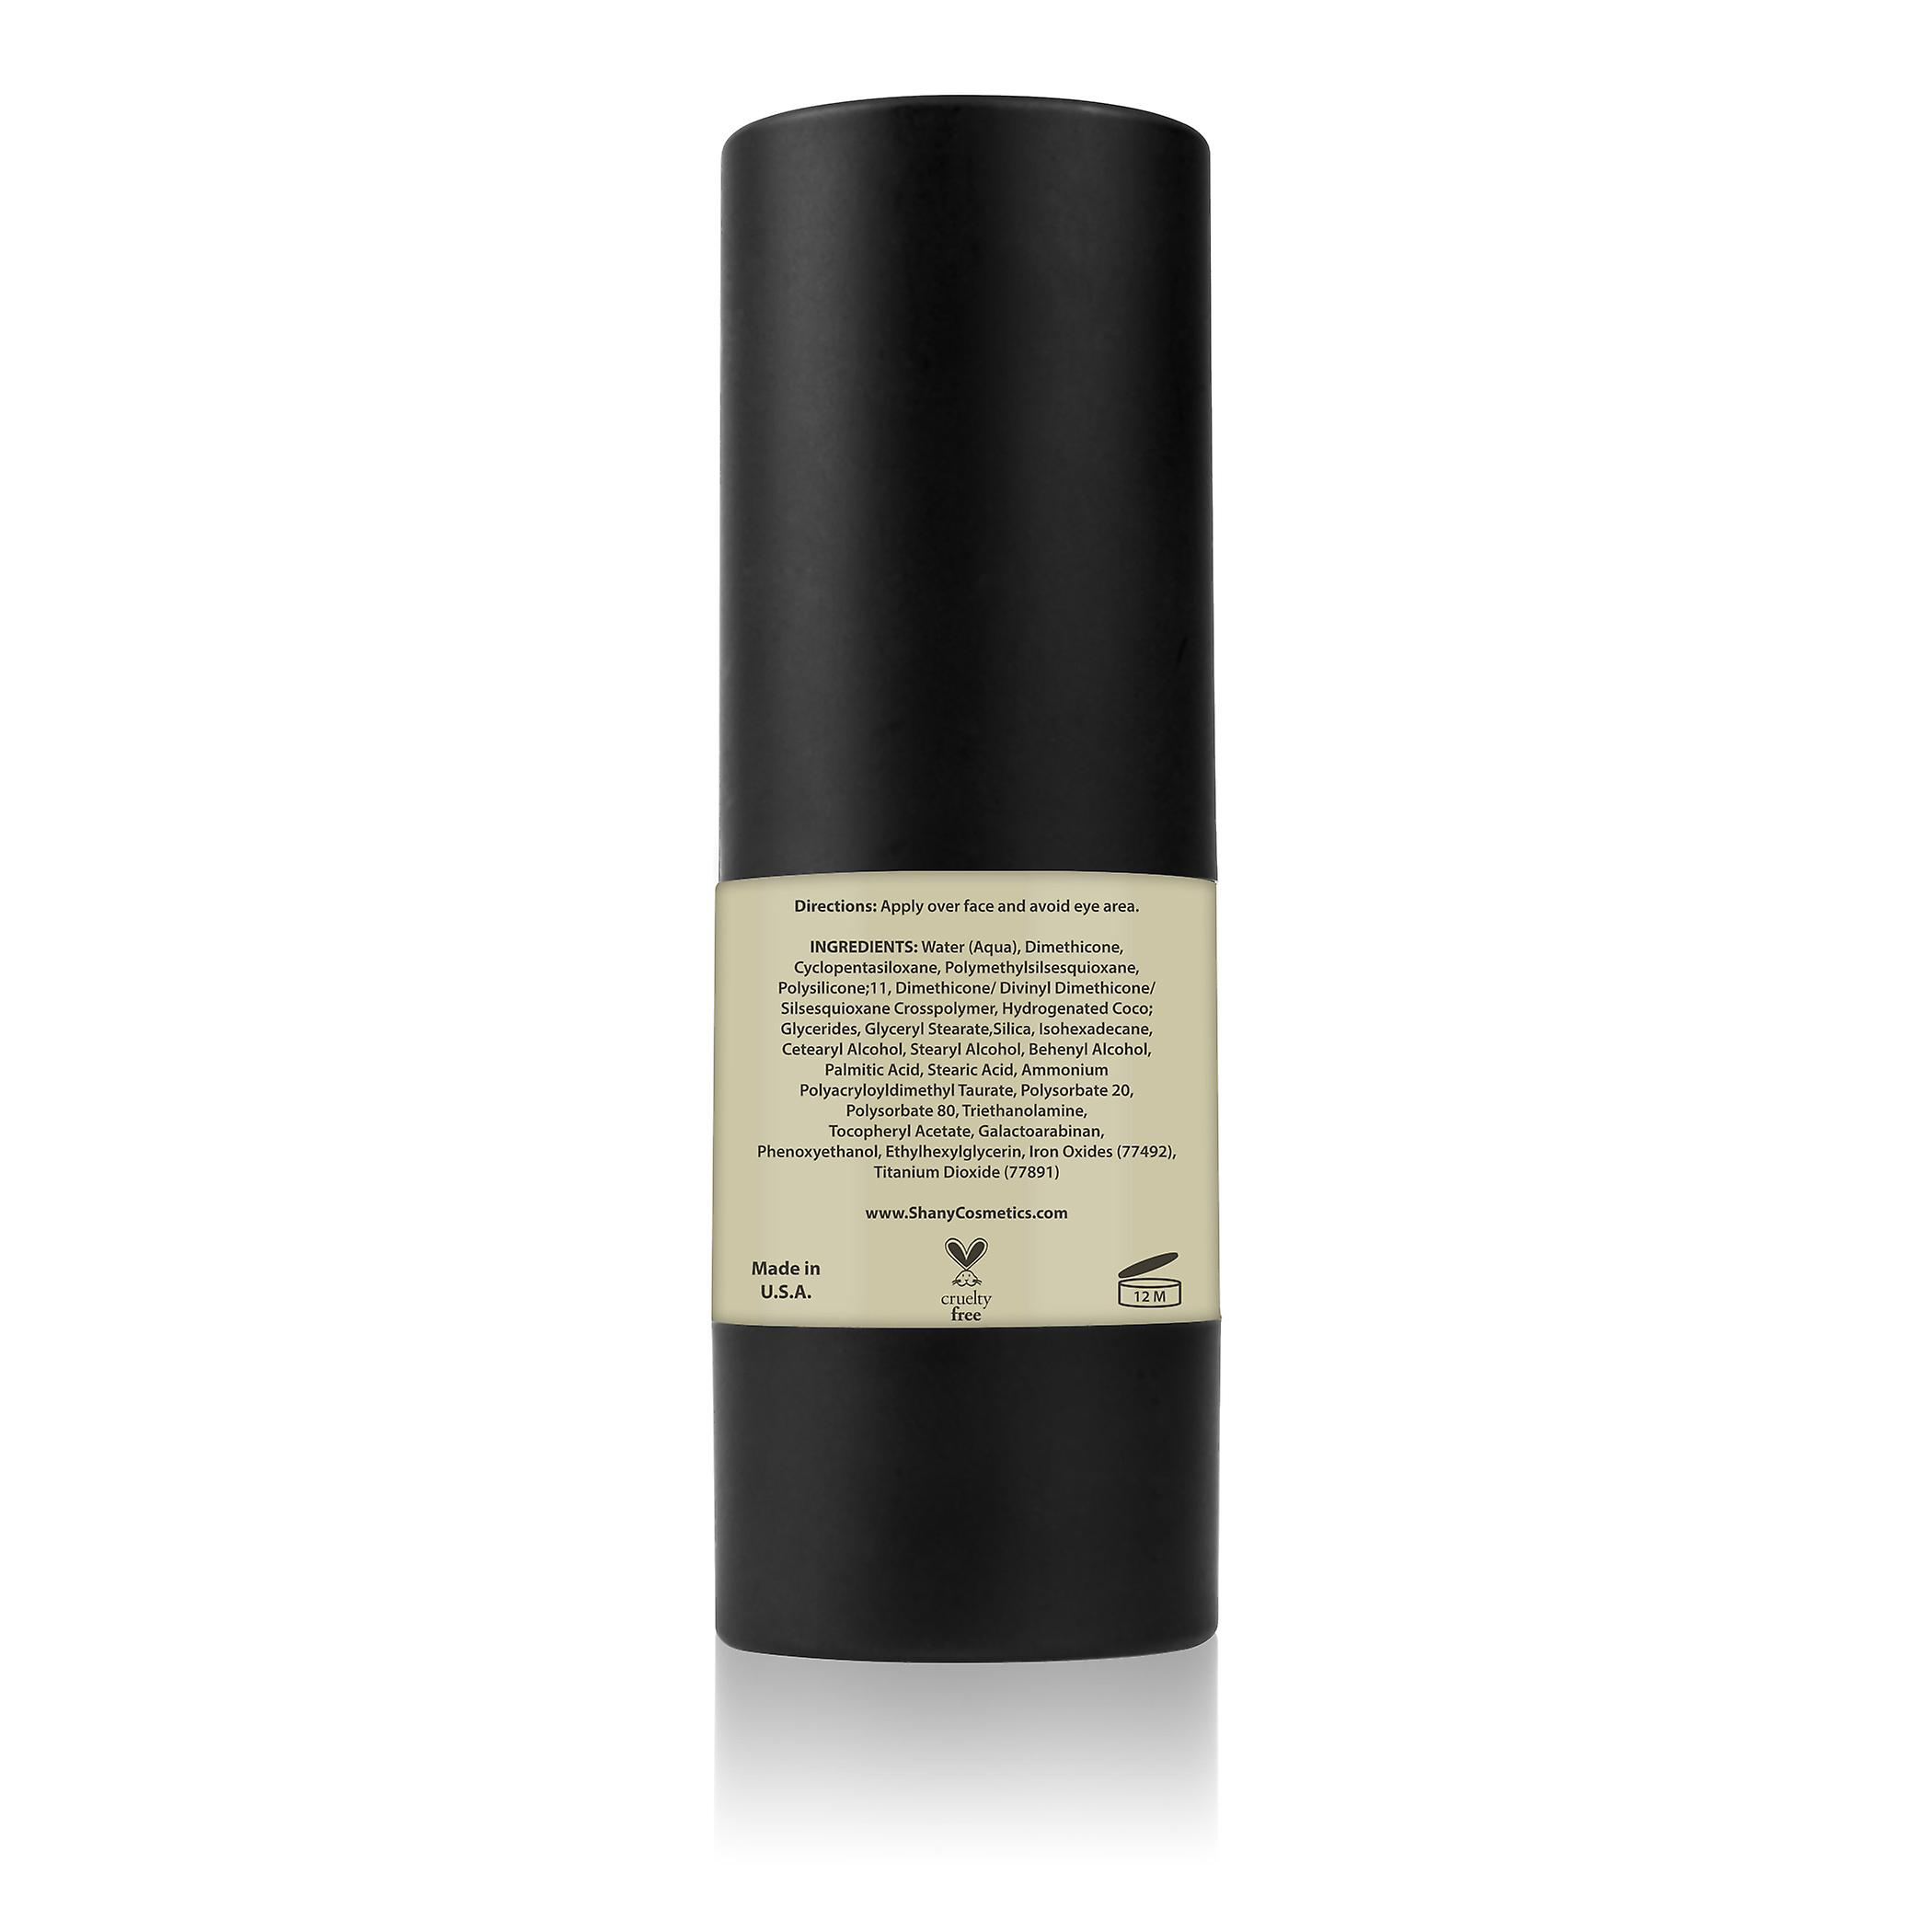 SHANY Paraben Free/Talc Free Oil Control MATTIFIER - 0.5 OZ. AIRLESS PUMP